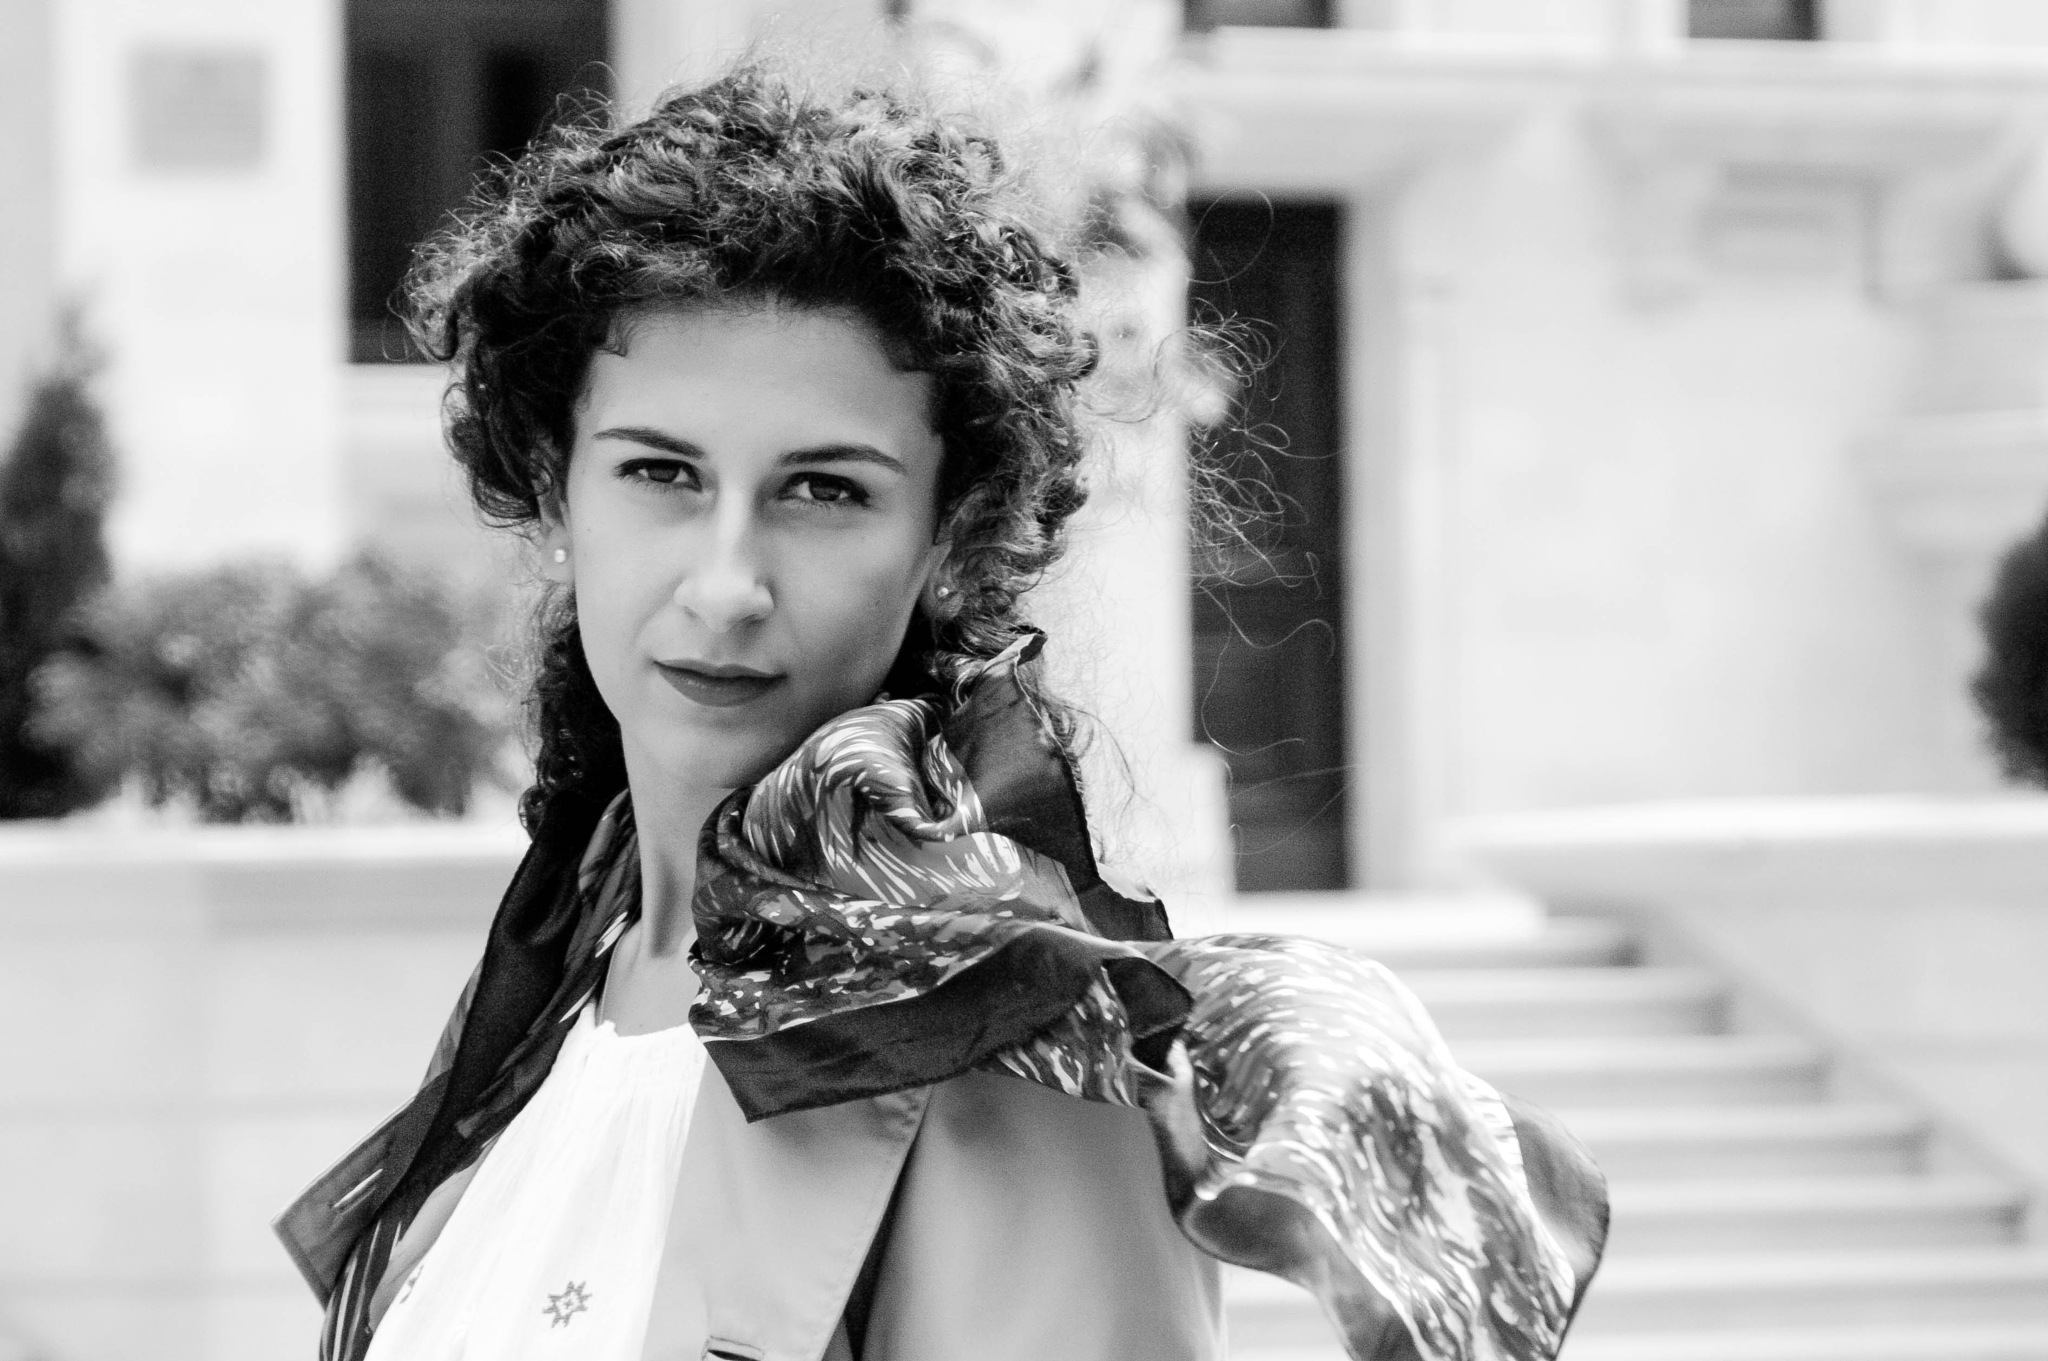 Girl with scarf by Teodor Bordeianu